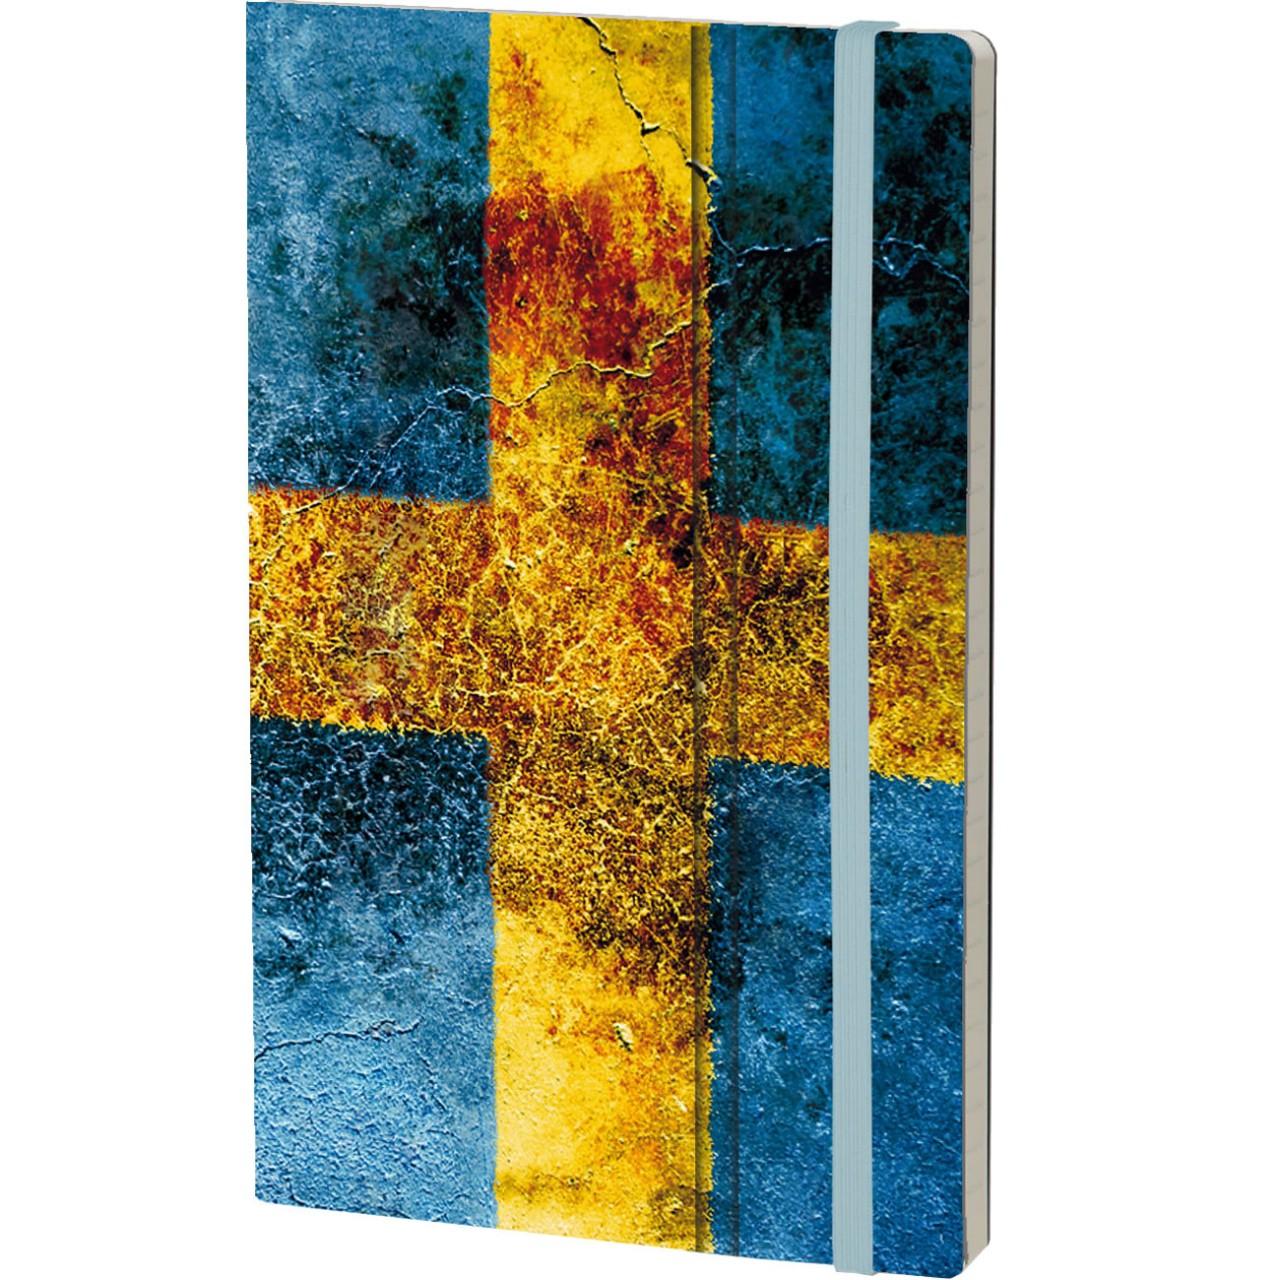 Stifflexible Notizbuch HISTORICAL NOTES 13 x 21 cm 192 S., DU GAMLA, DU FRIA (Sweden Flag)